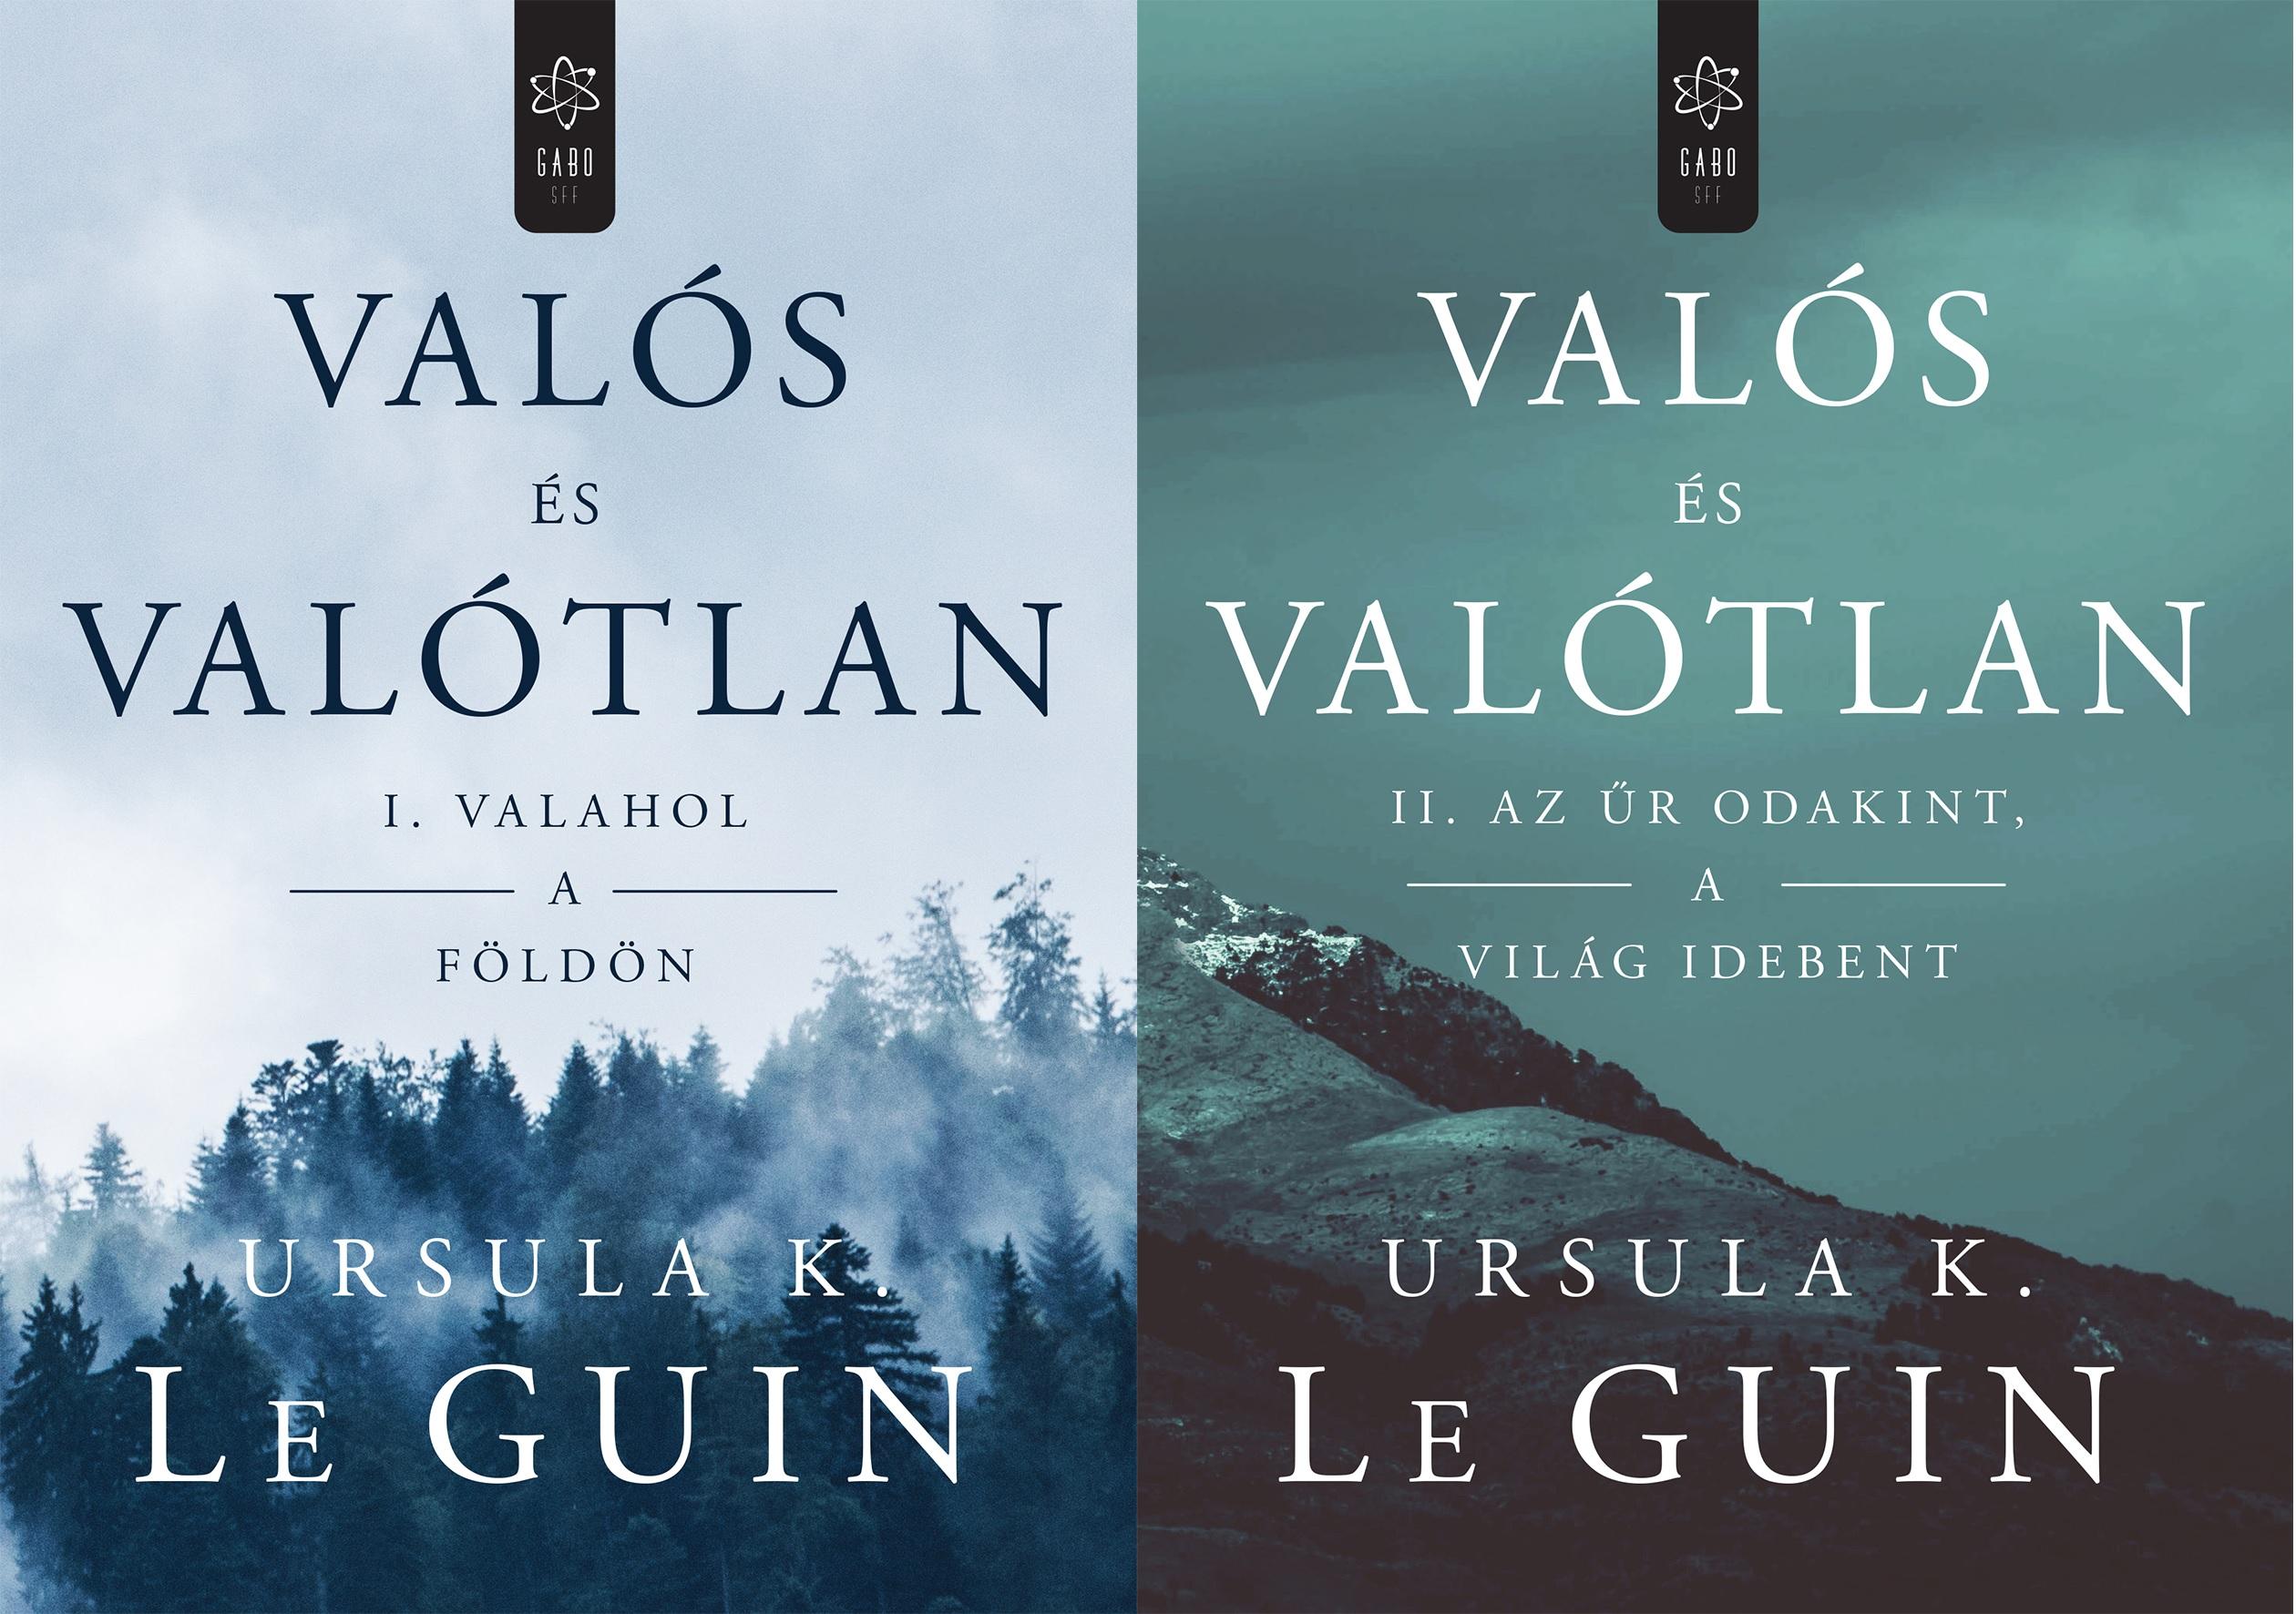 valos_es_valotlan_i-ii.jpg